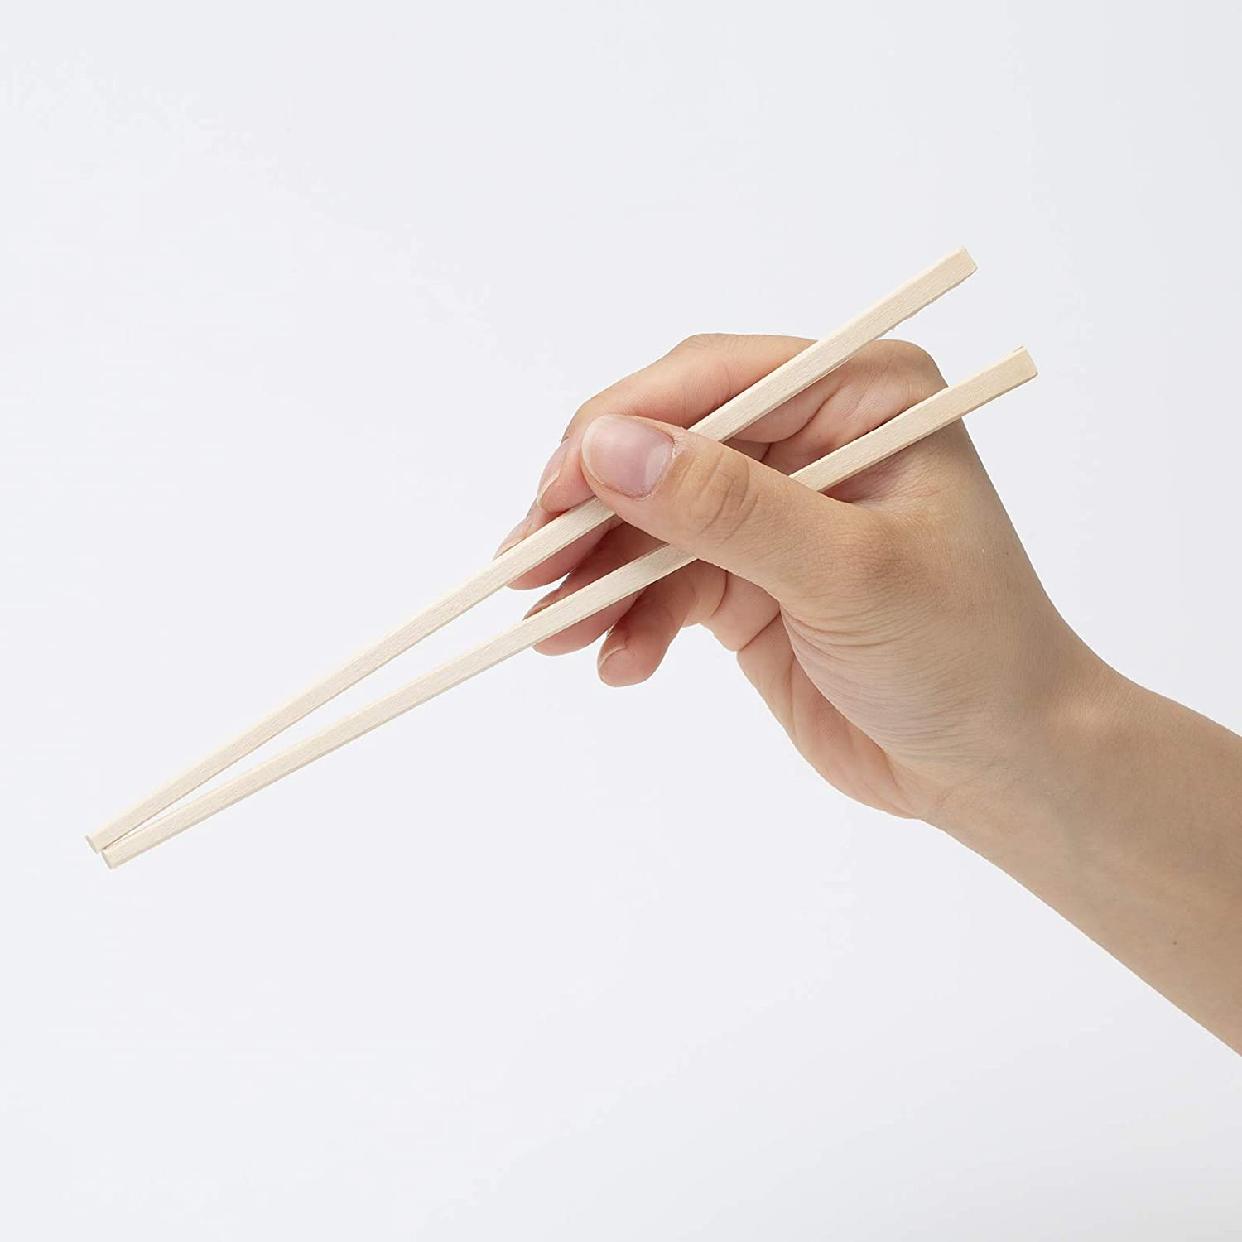 HouseLab(ハウスラボ)元禄割箸 袋入り 100膳 AR-002 20.5cmの商品画像5